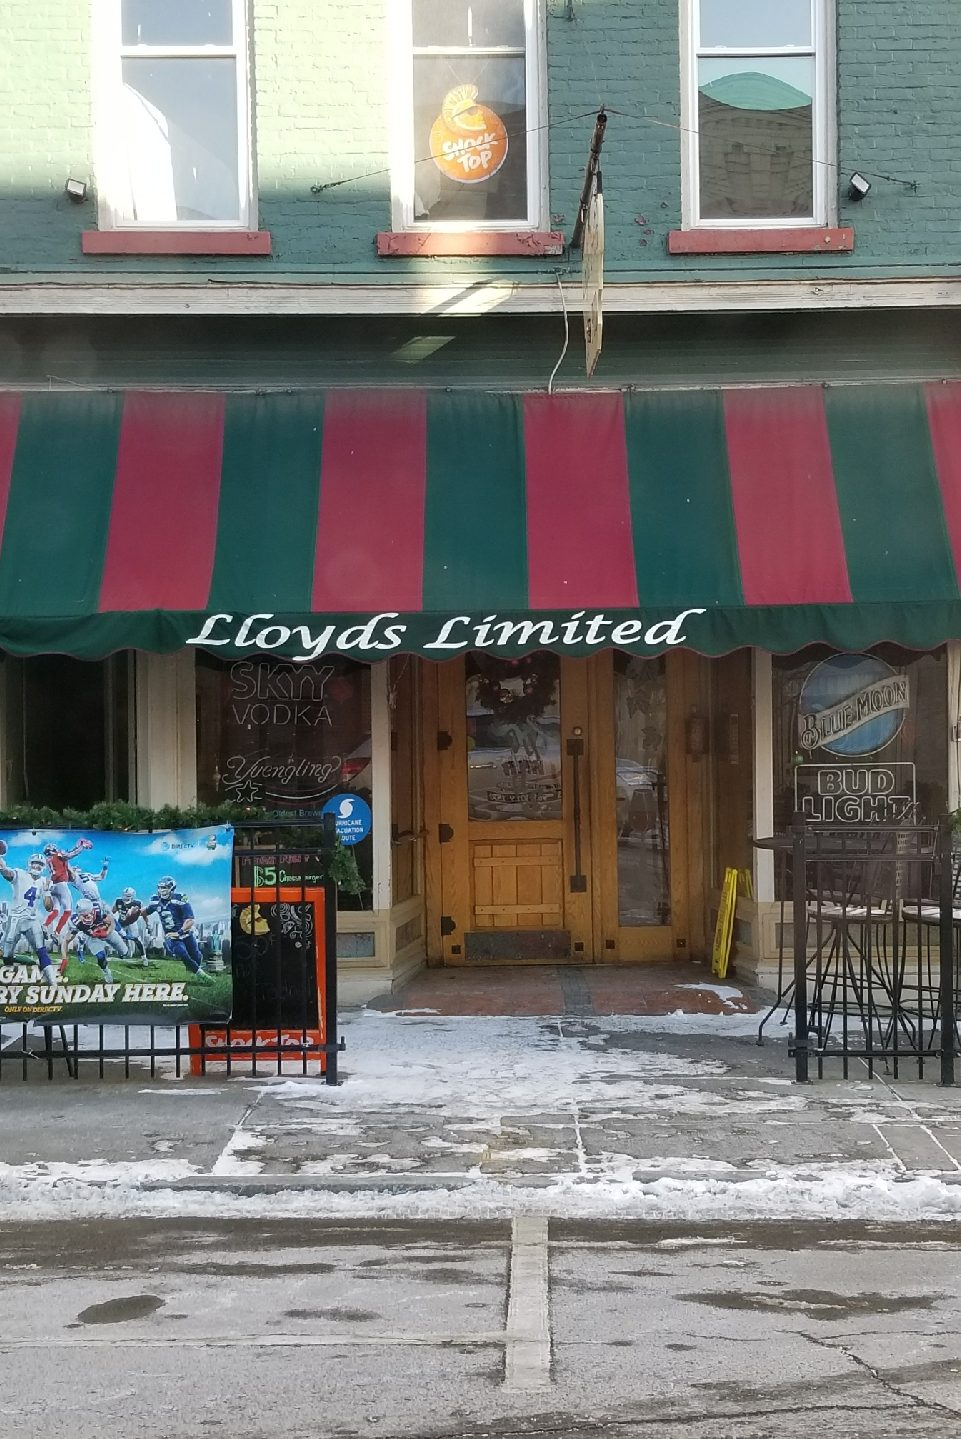 State Suspends Champlin's Liquor License For Lloyd's Limited Pub